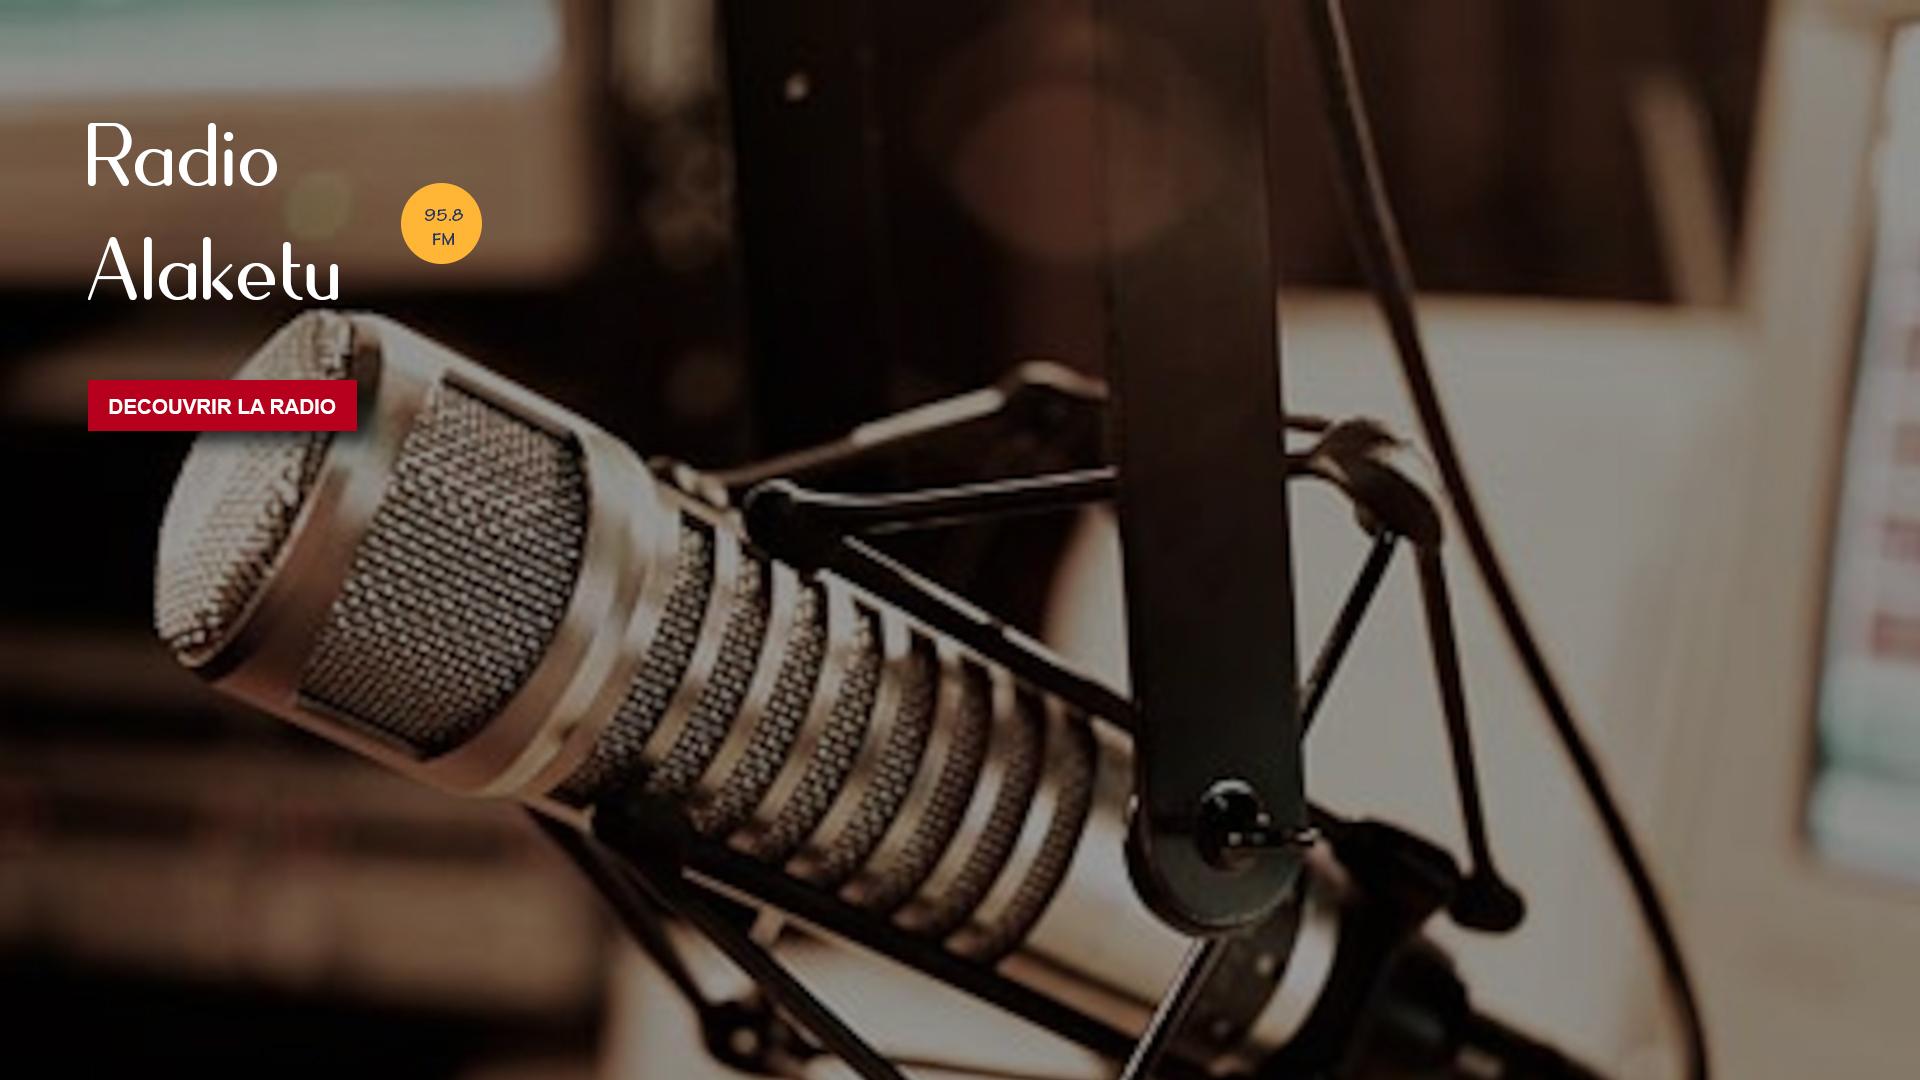 Bienvenue sur le portail de Radio Alaketu